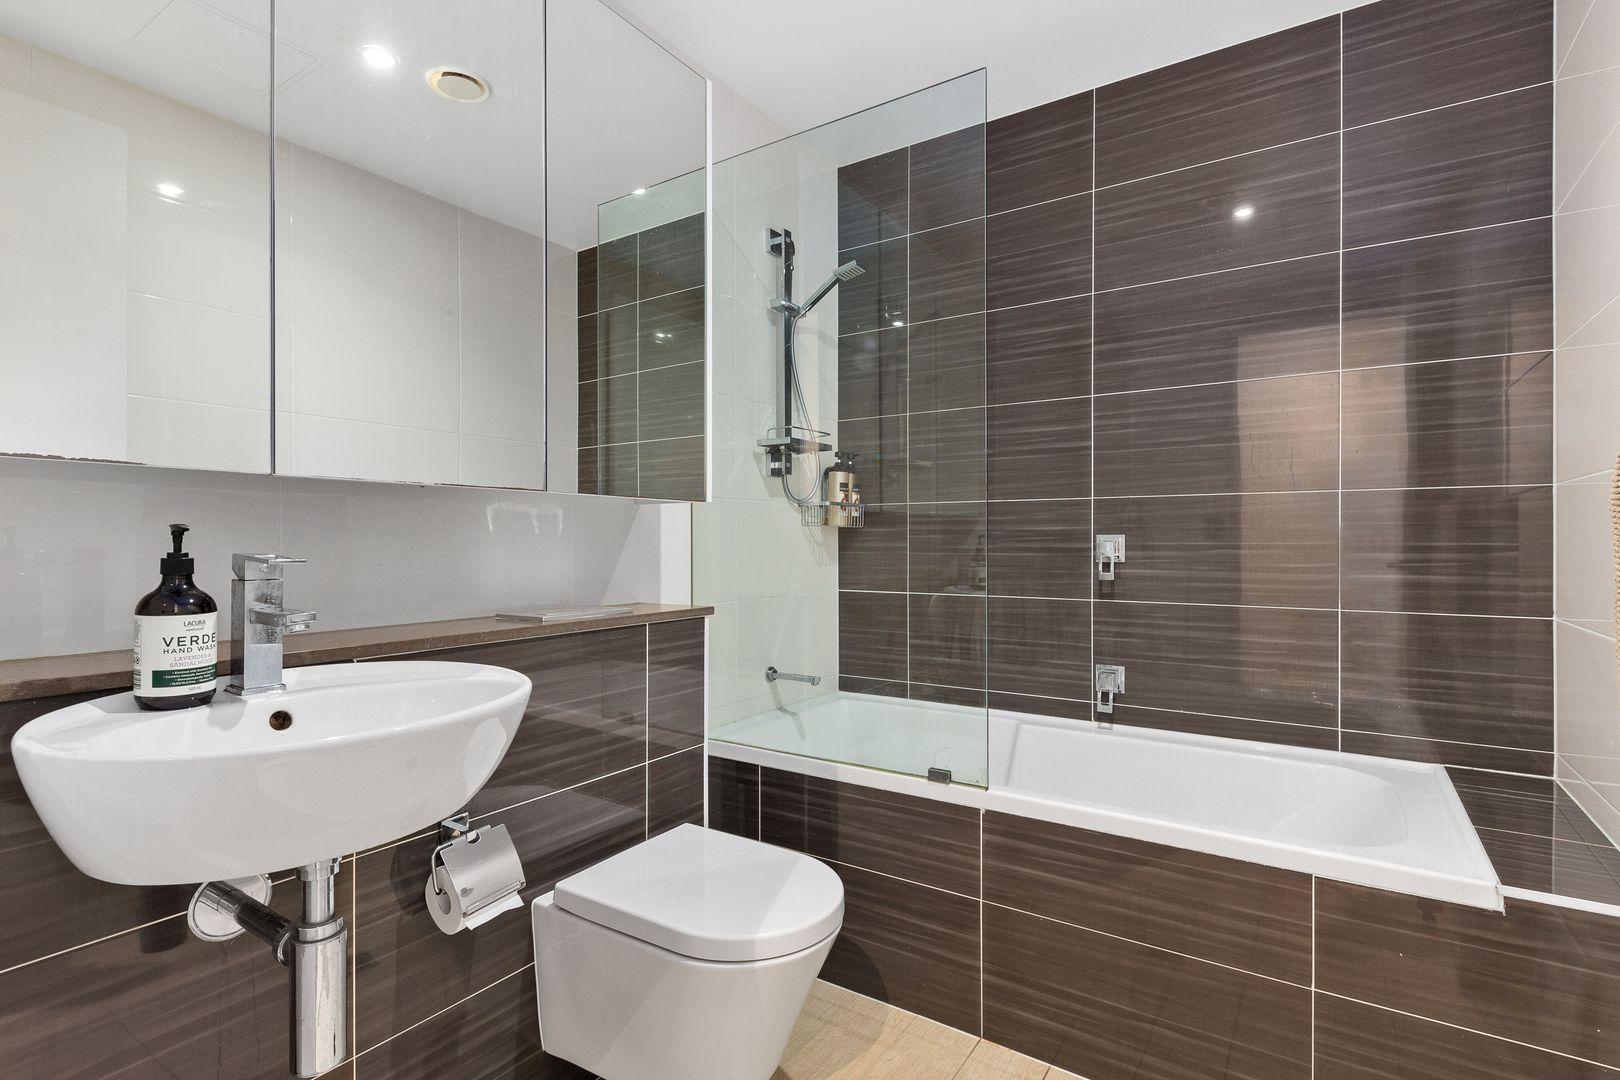 215/5 Alma  Road, Macquarie Park NSW 2113, Image 2